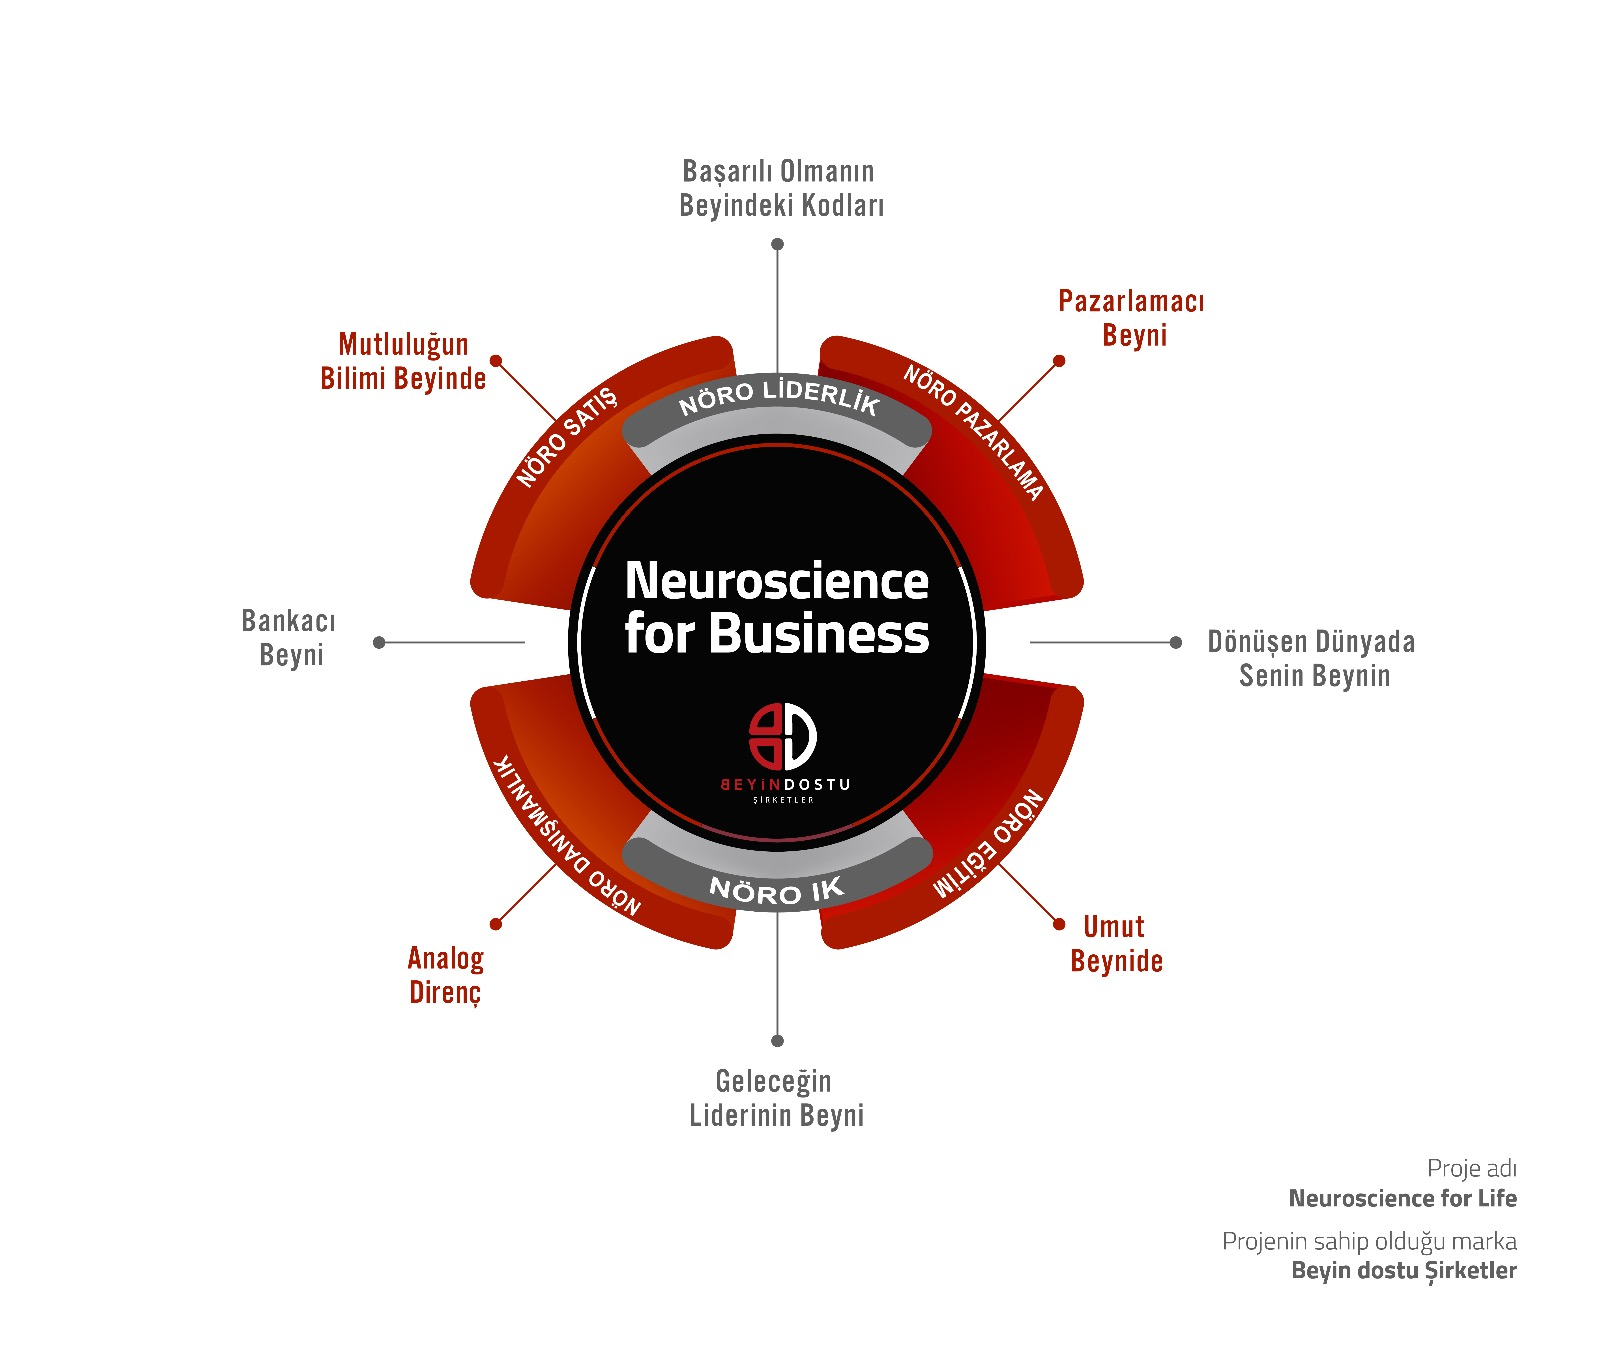 Neuroscience-For-Business